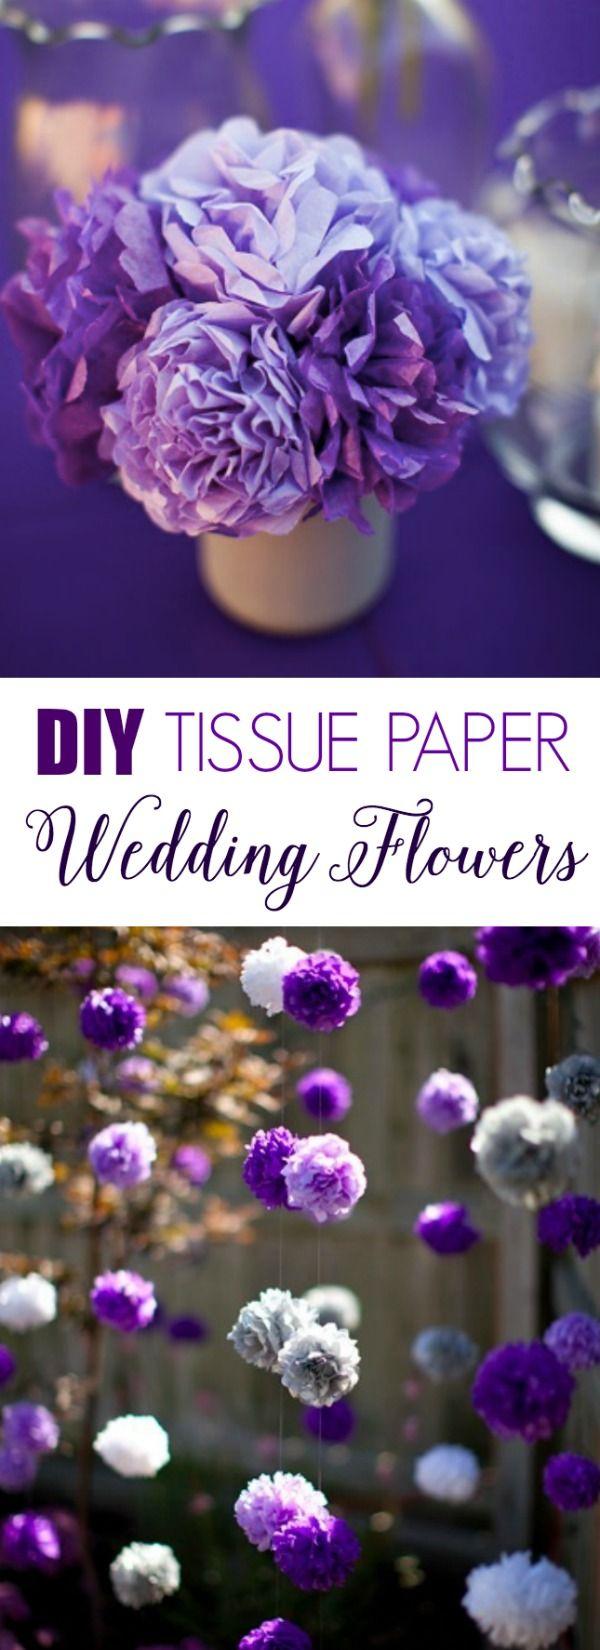 DIY Tissue Paper Flowers Mid South Bride